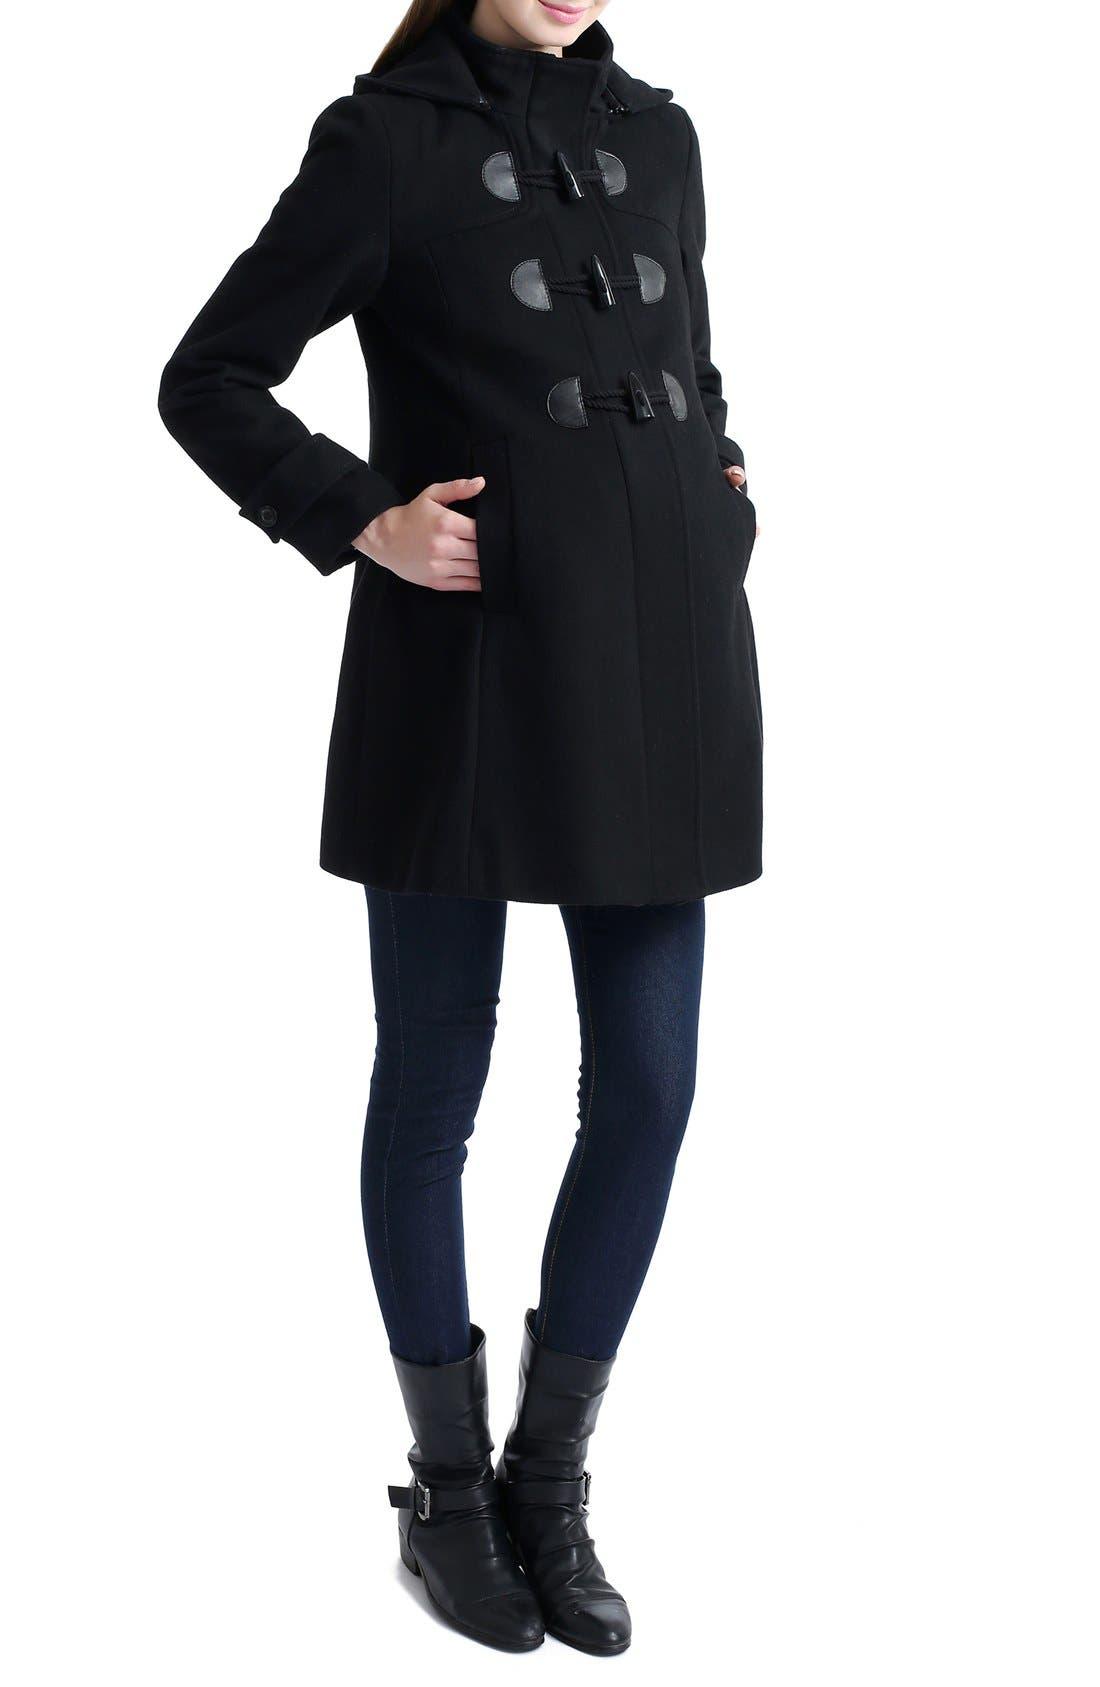 KIMI AND KAI, 'Paisley' Maternity Duffle Coat, Main thumbnail 1, color, BLACK